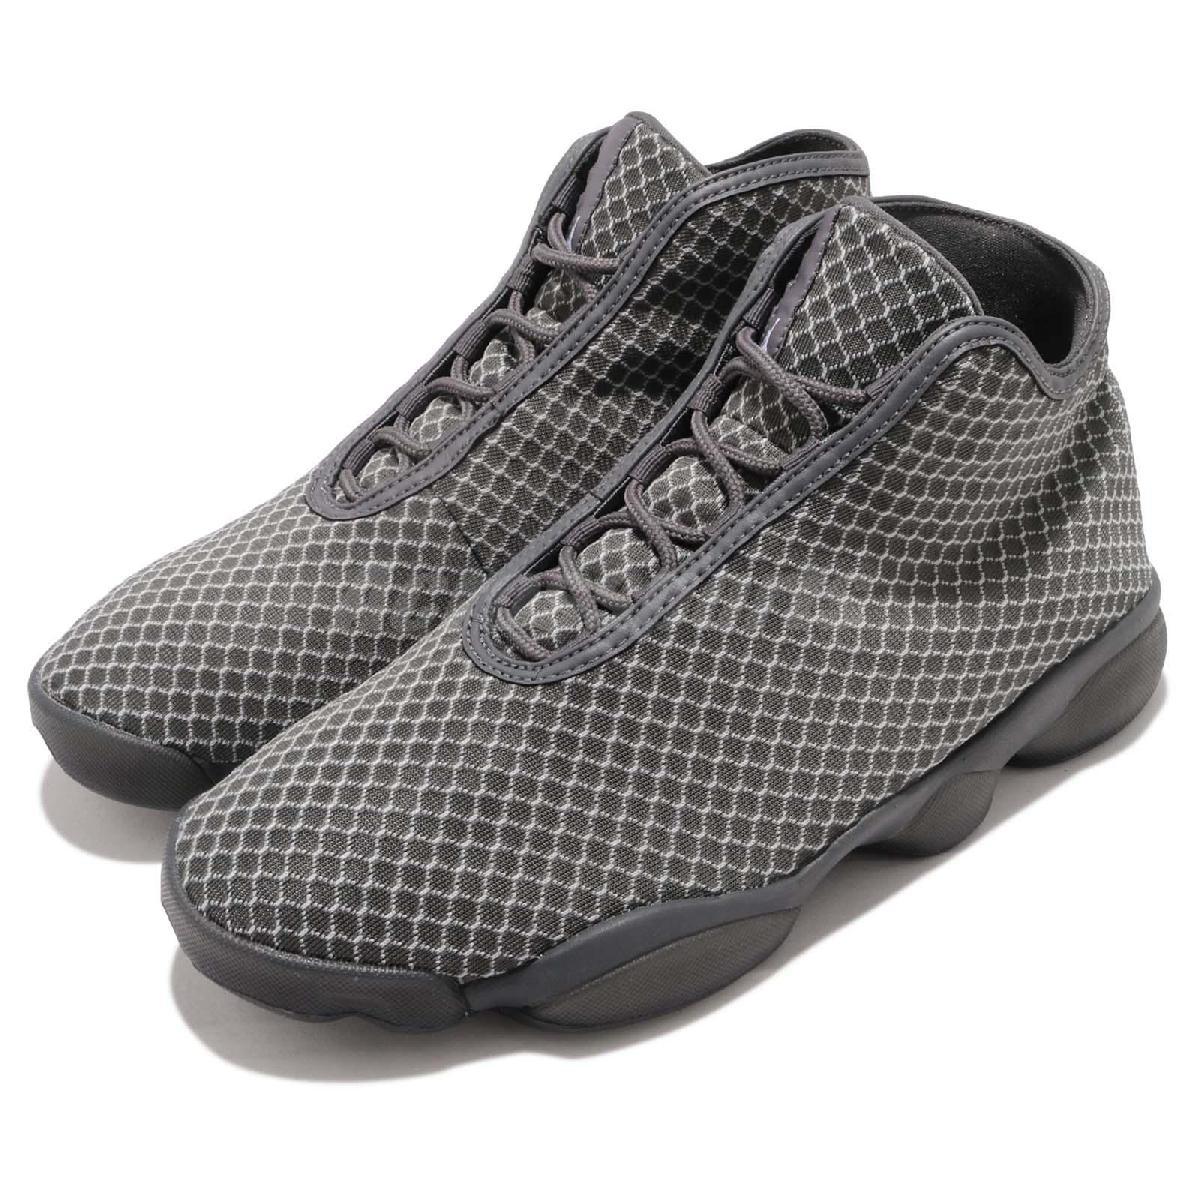 Nike Jordan Horizon AJ13鞋底灰色喬丹飛人男鞋籃球鞋PUMP306 823581-003